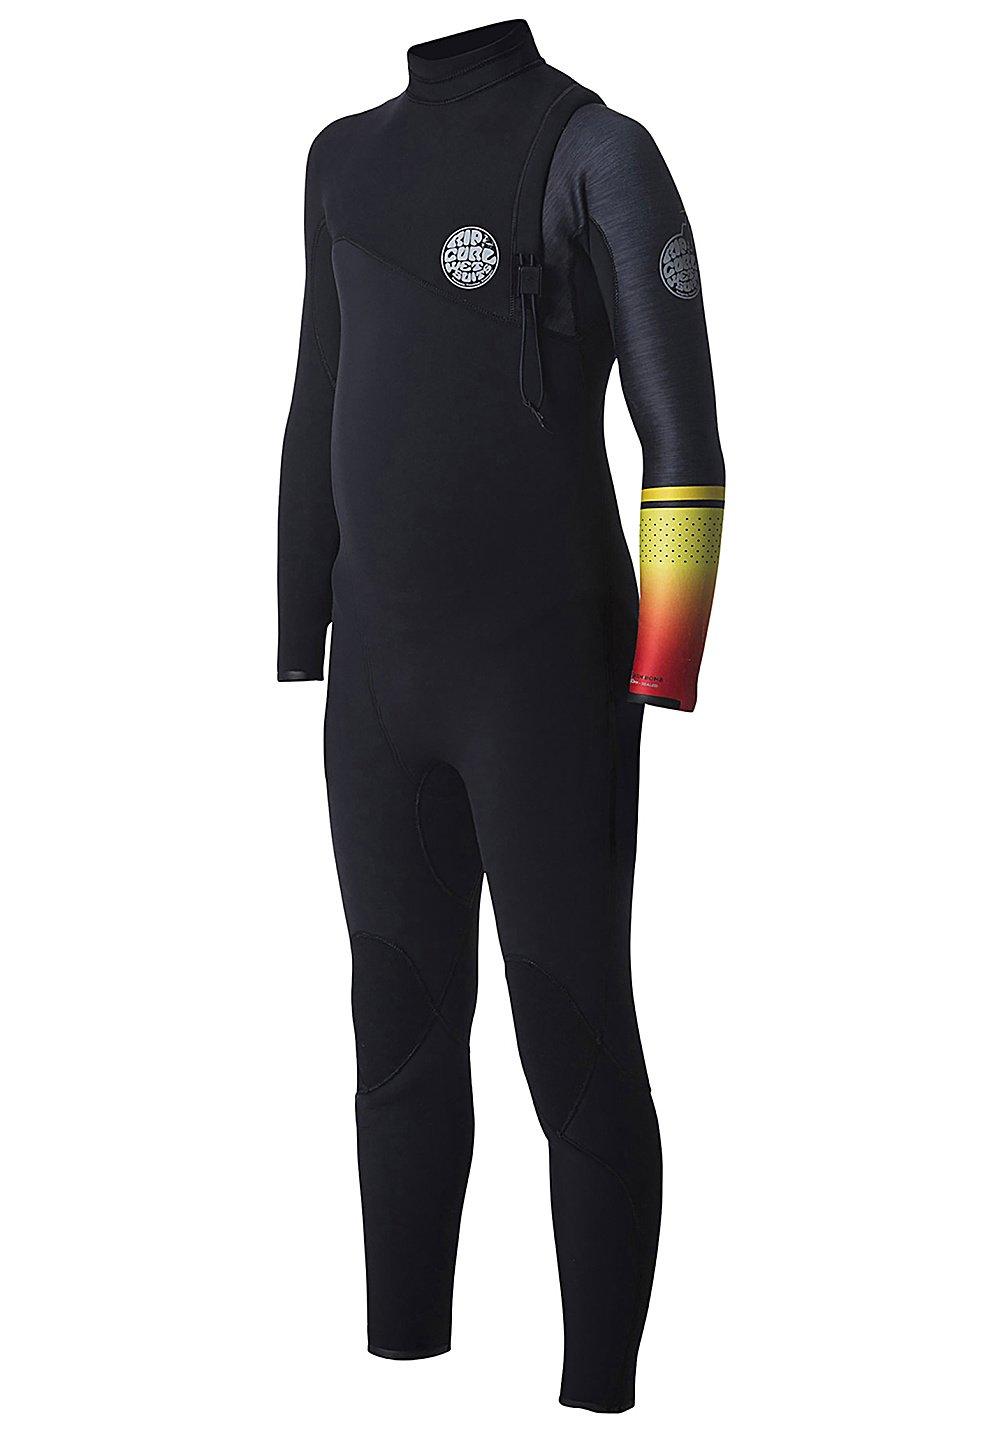 2017 Rip Curl Junior Flashbomb 5/3mm Zip Free Wetsuit Orange WSM7NS Age / Size - 12 Years